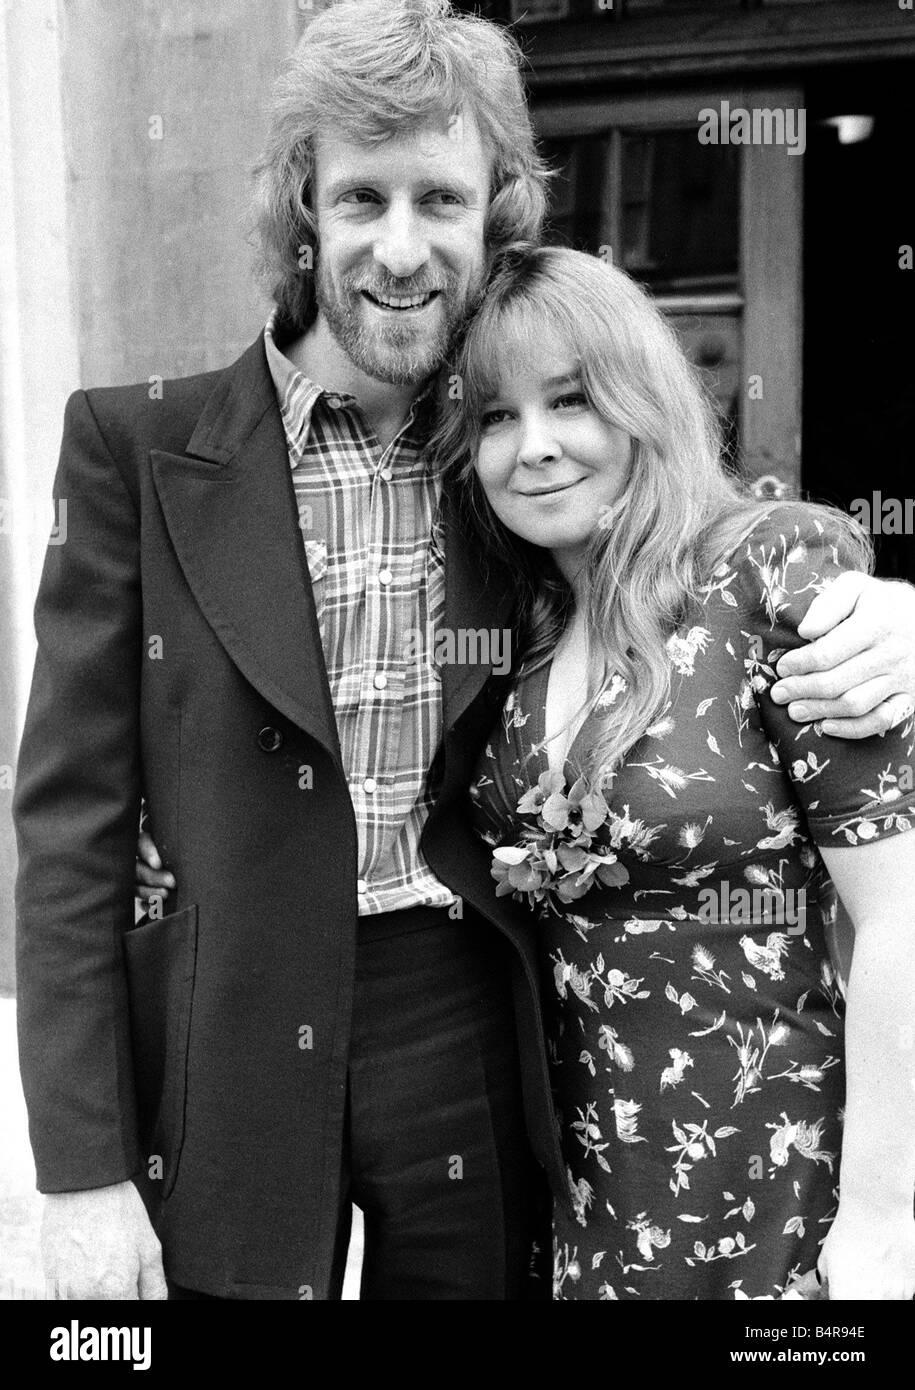 Folk Singer Sandy Denny marries Trevor Lucas of the Folk Group Fairport Convention at Fulham registry office September - Stock Image